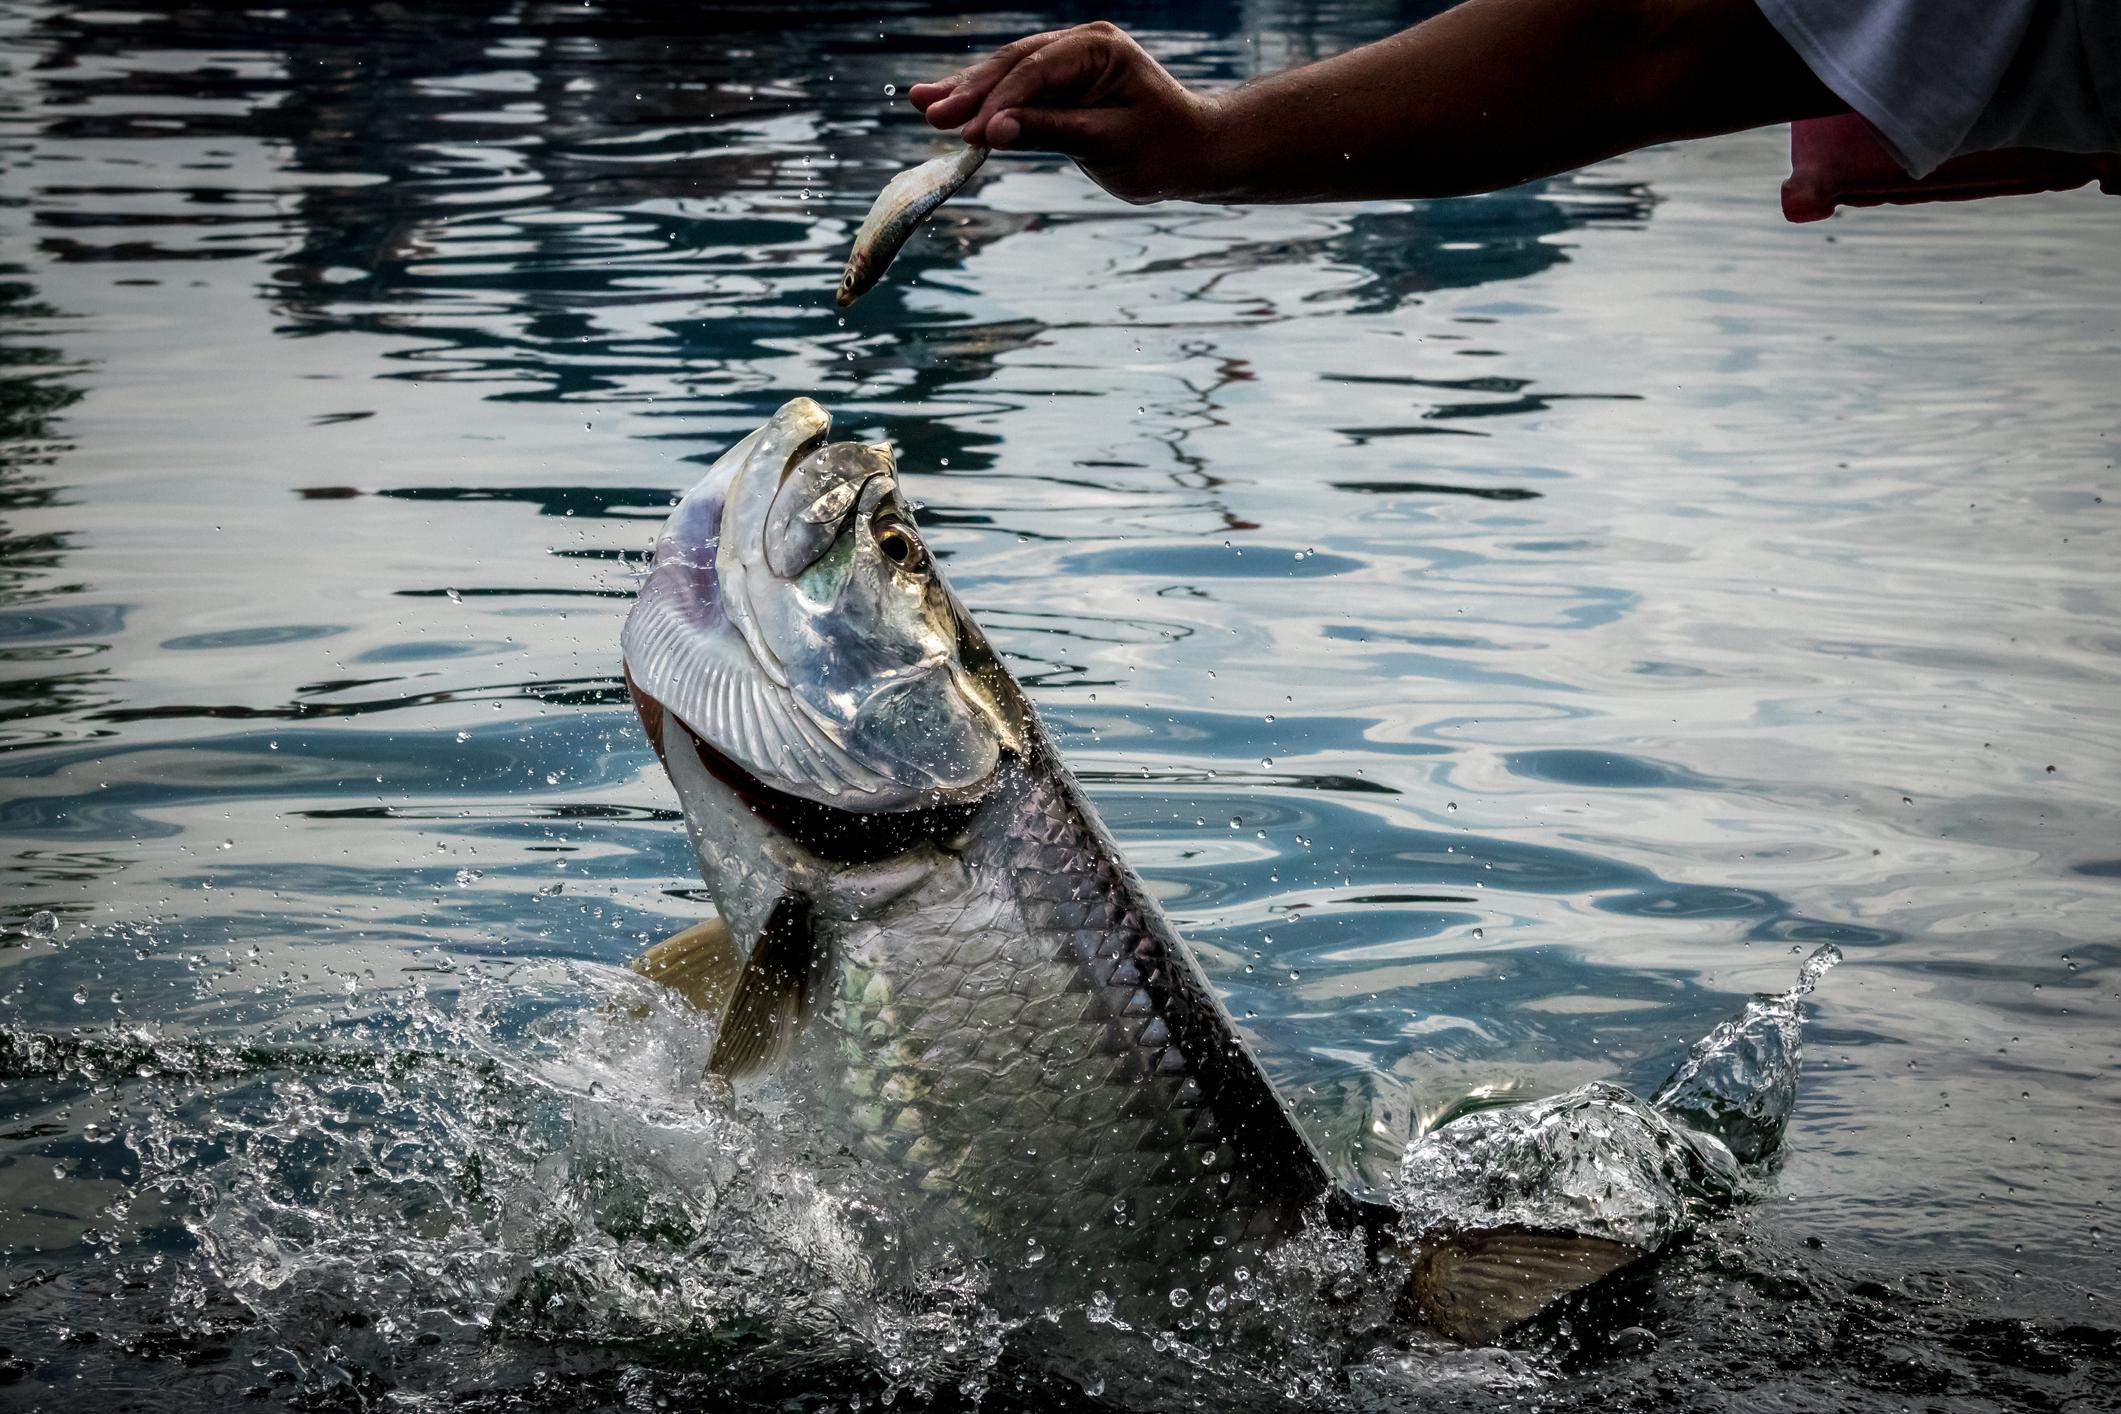 Tarpon fishing season in Florida, fish jumping out of water